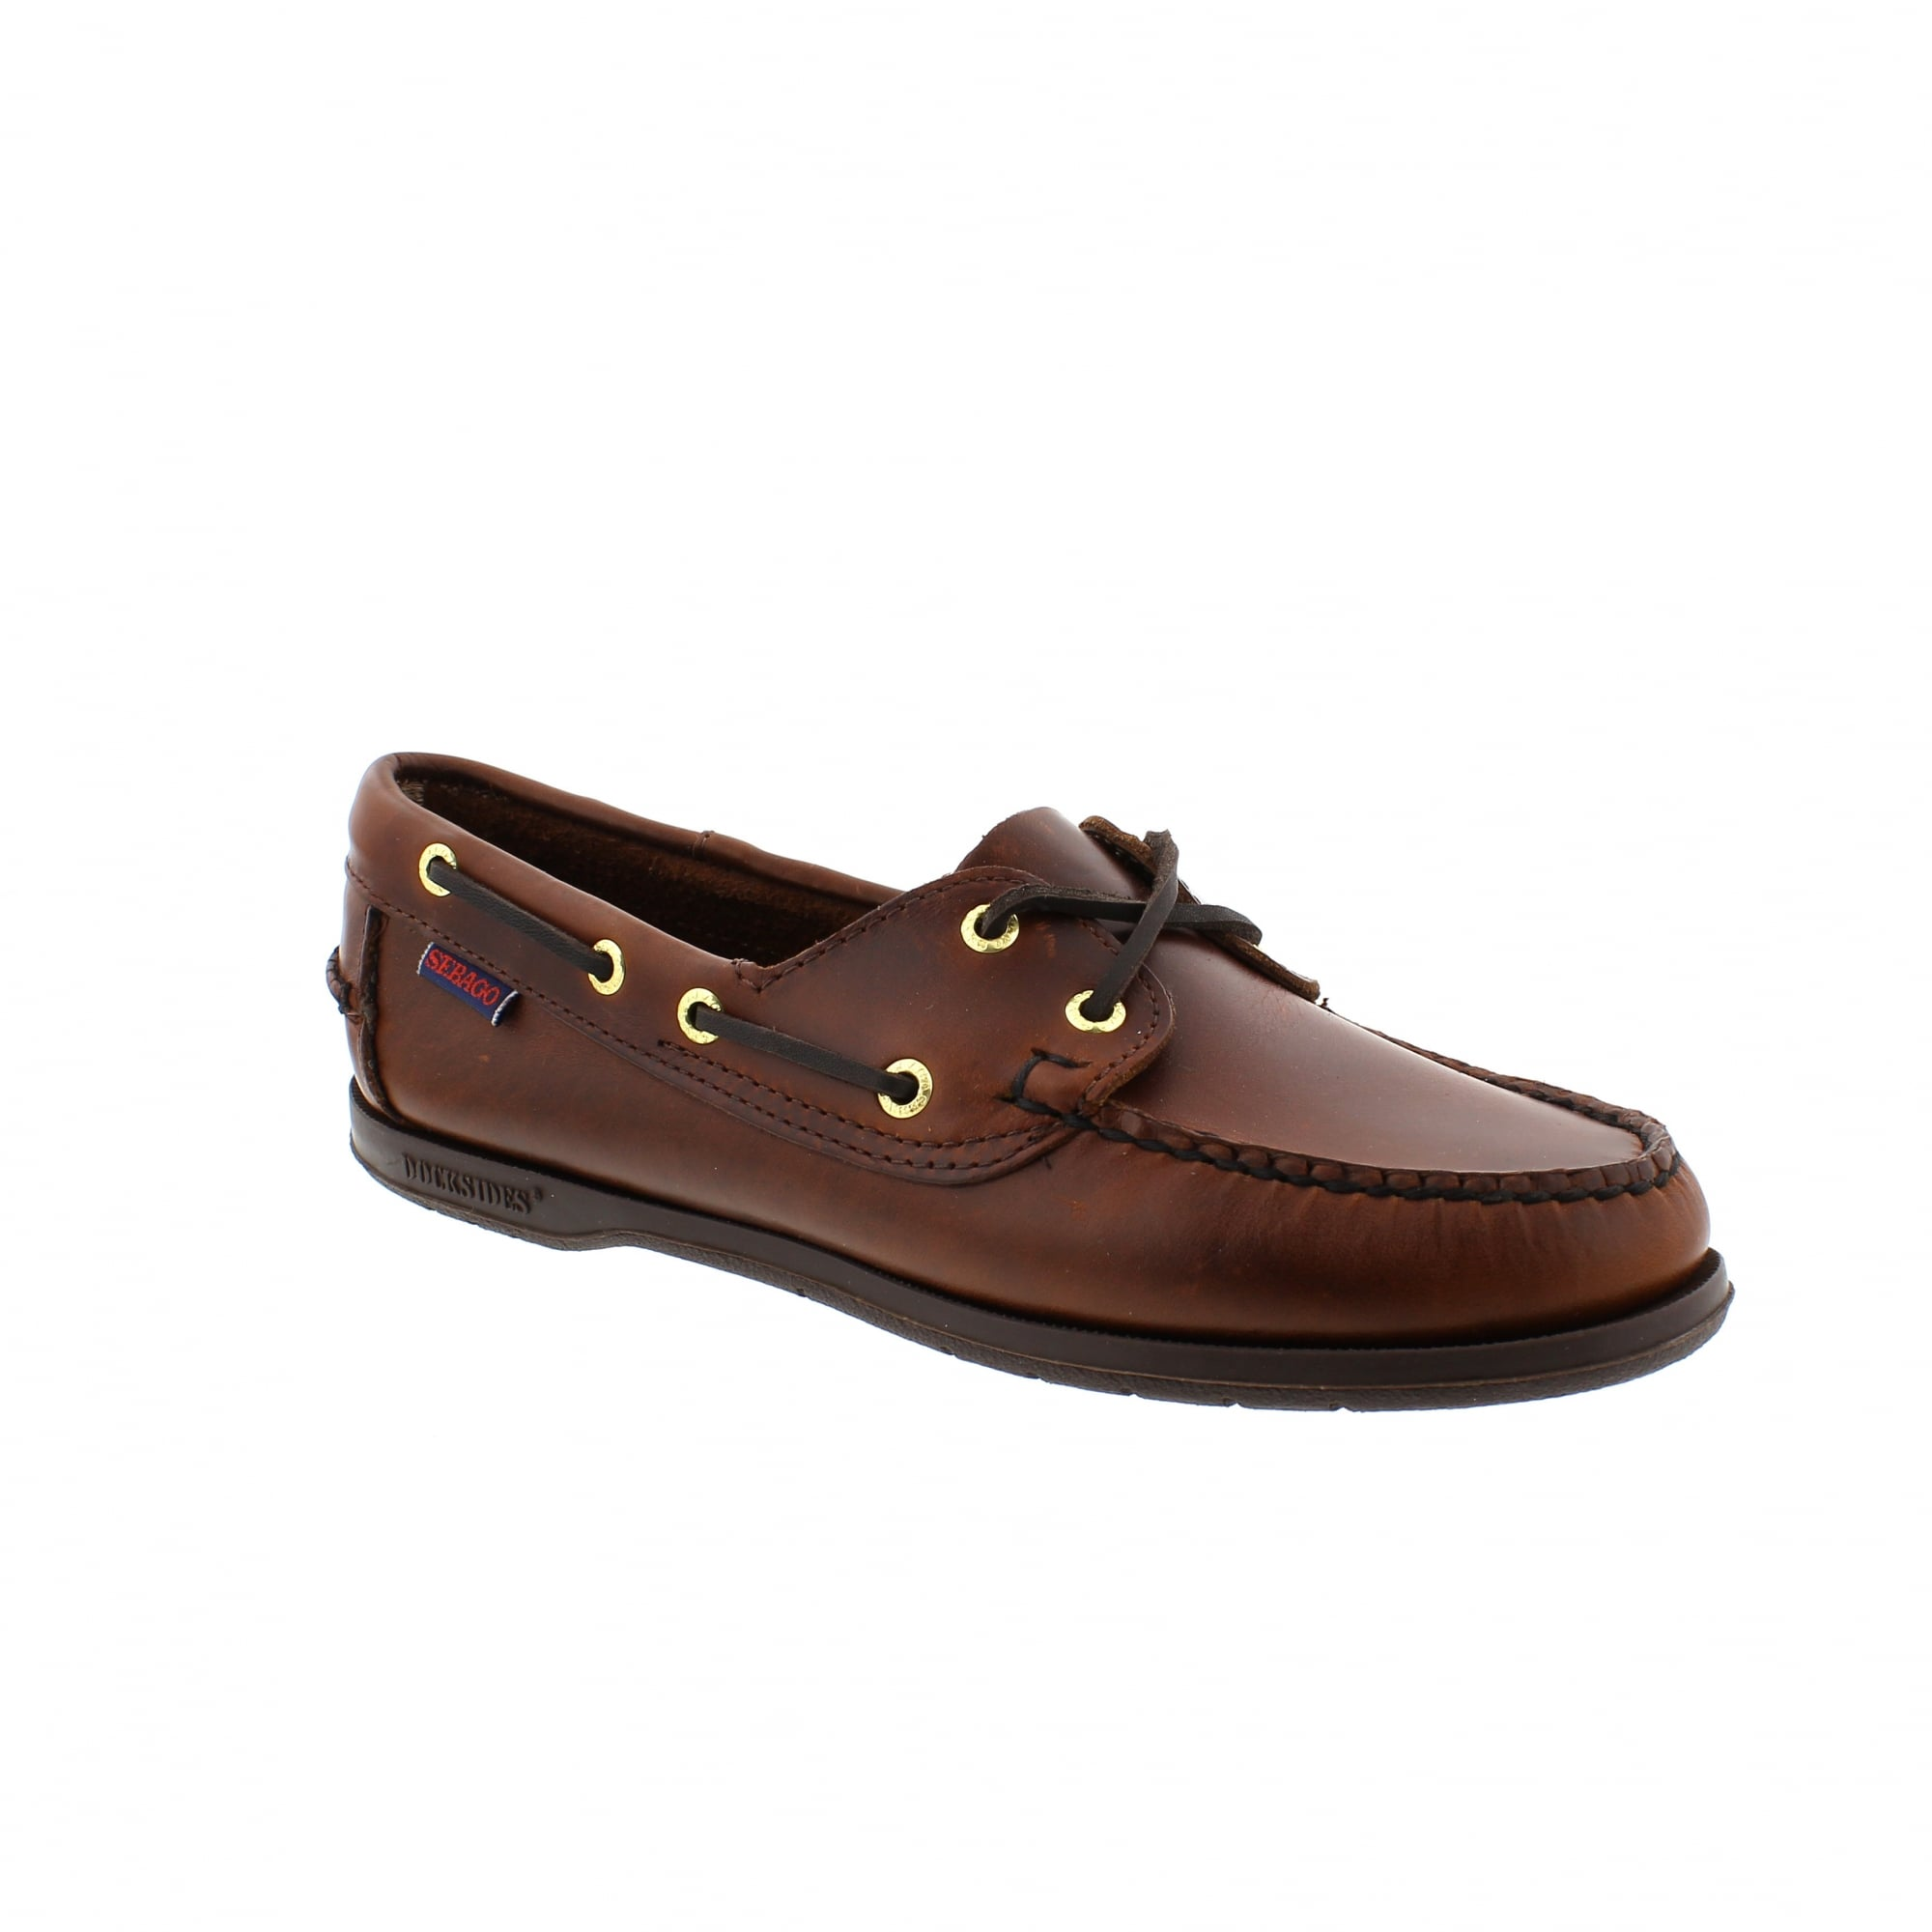 ae93361ae53f5 Sebago Victory 70006N0-925 Womens Boat Shoes